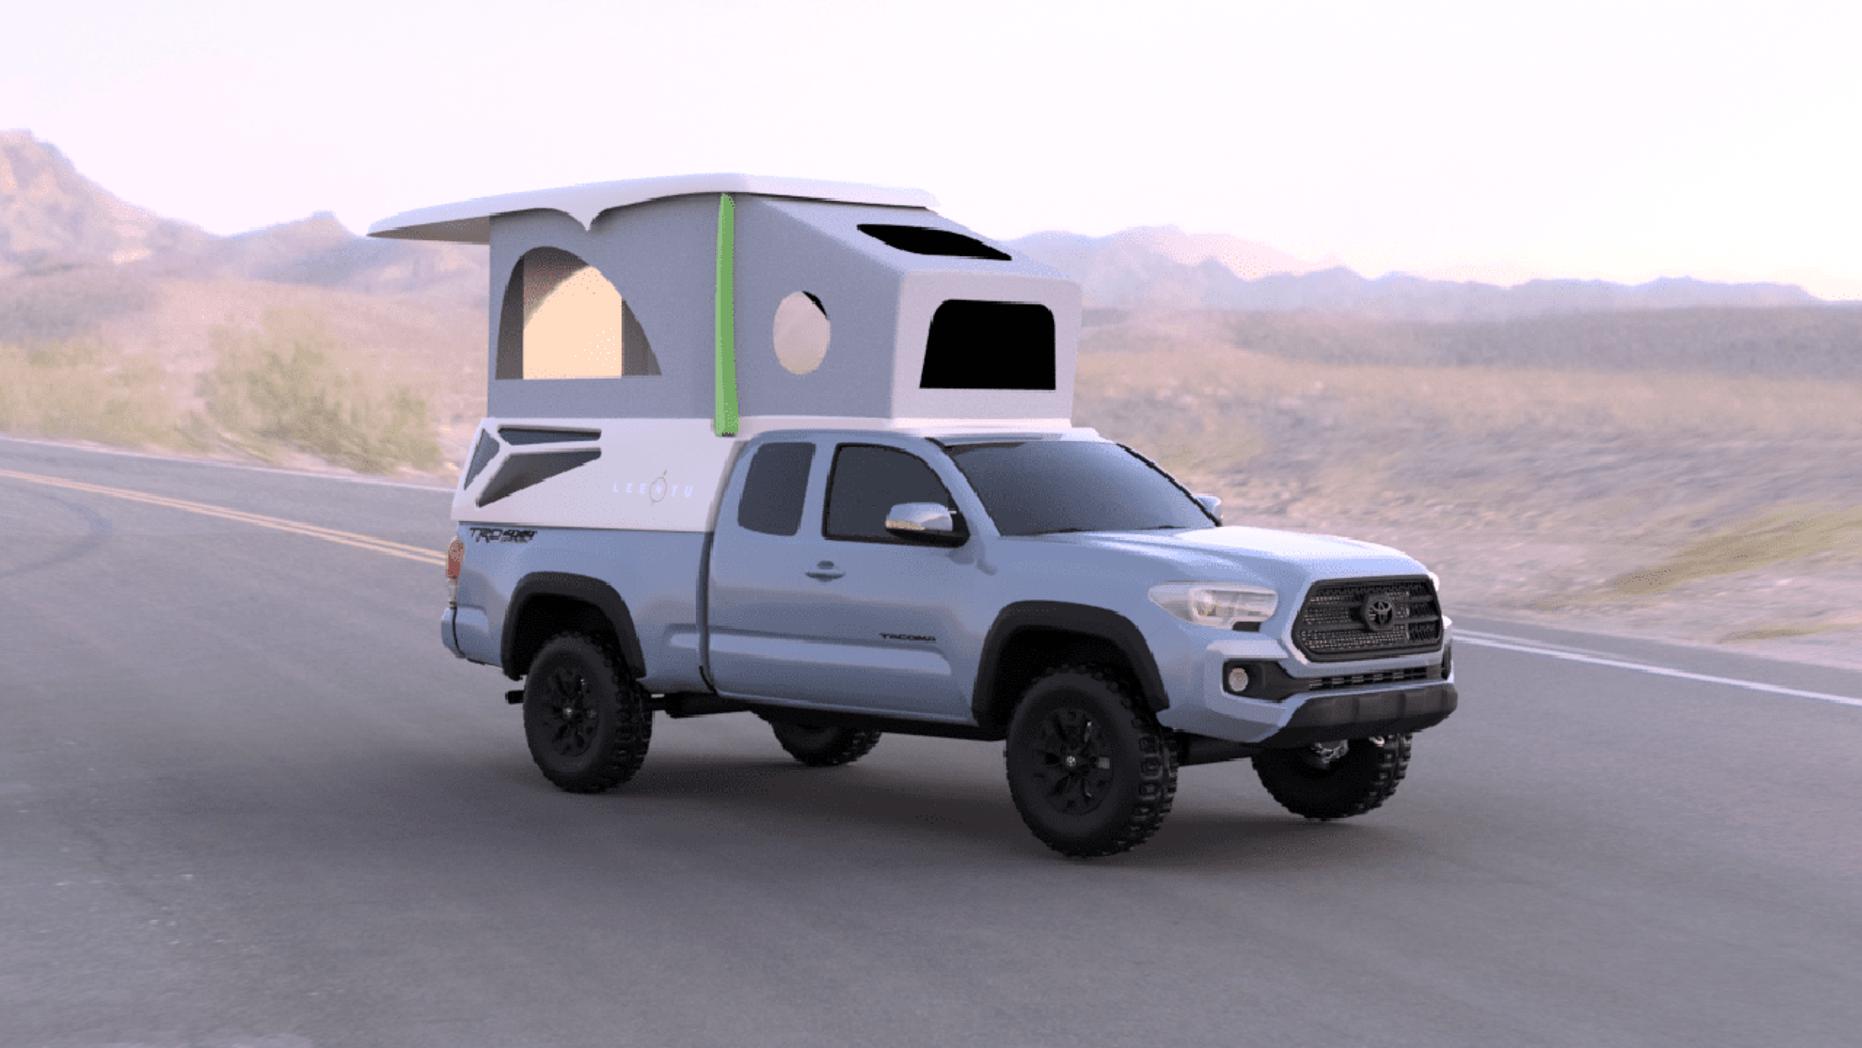 Leentu Is A Lightweight Pop Up Camper Built For The Toyota